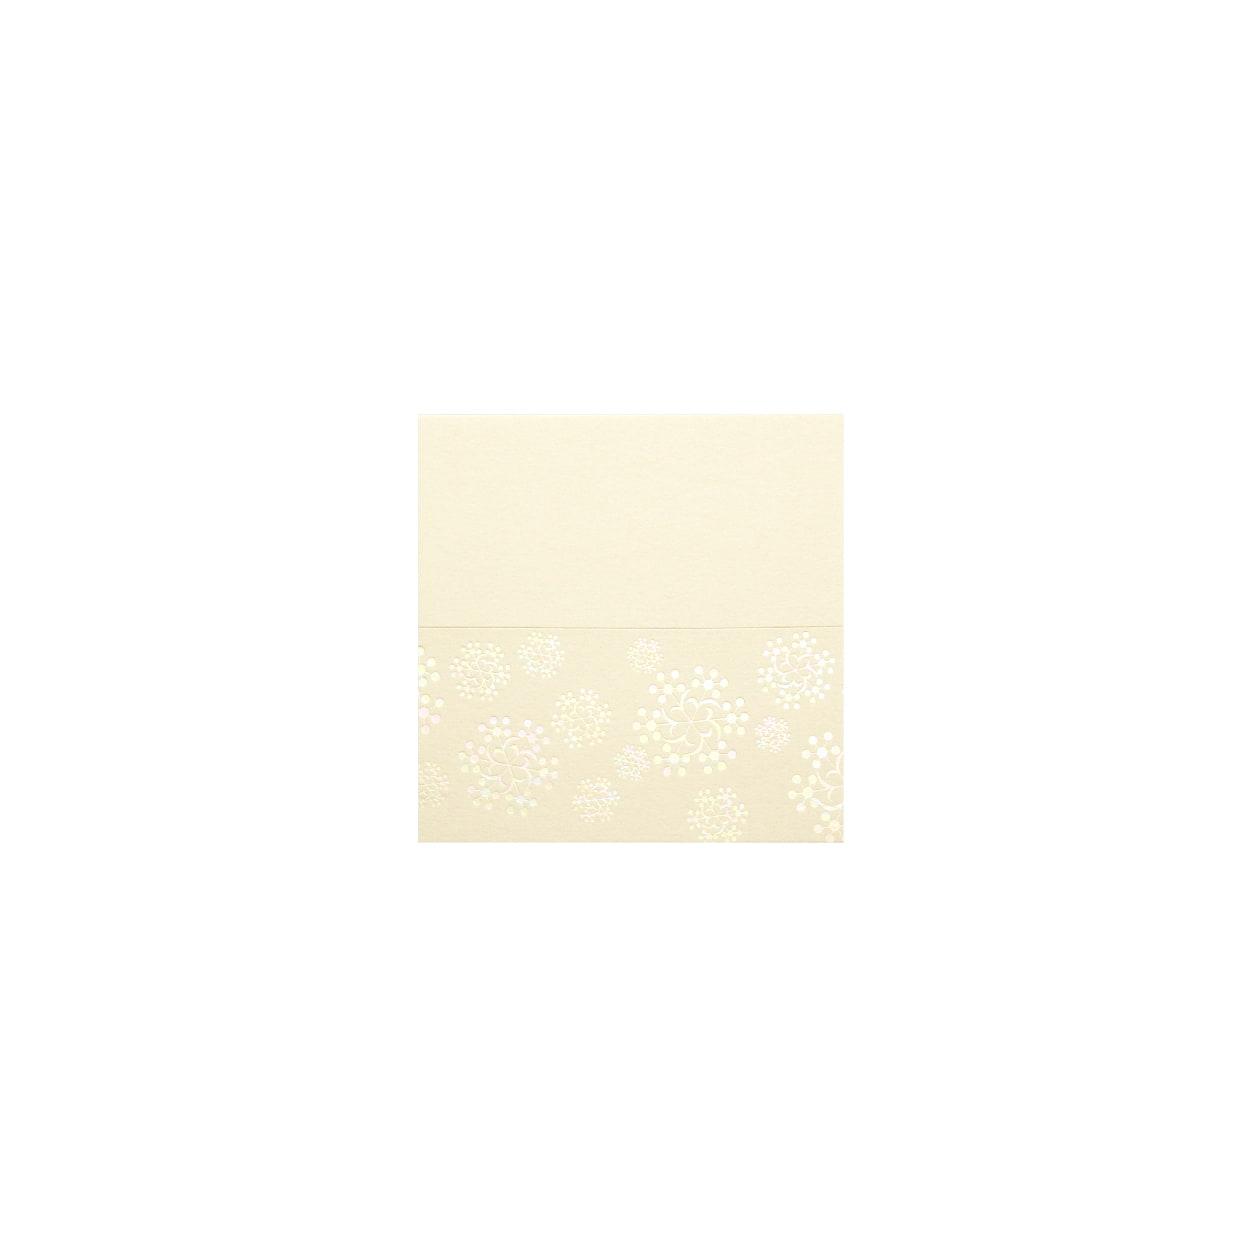 No.550SNOWFLAKE #29Vカード ナチュラル 232.8g